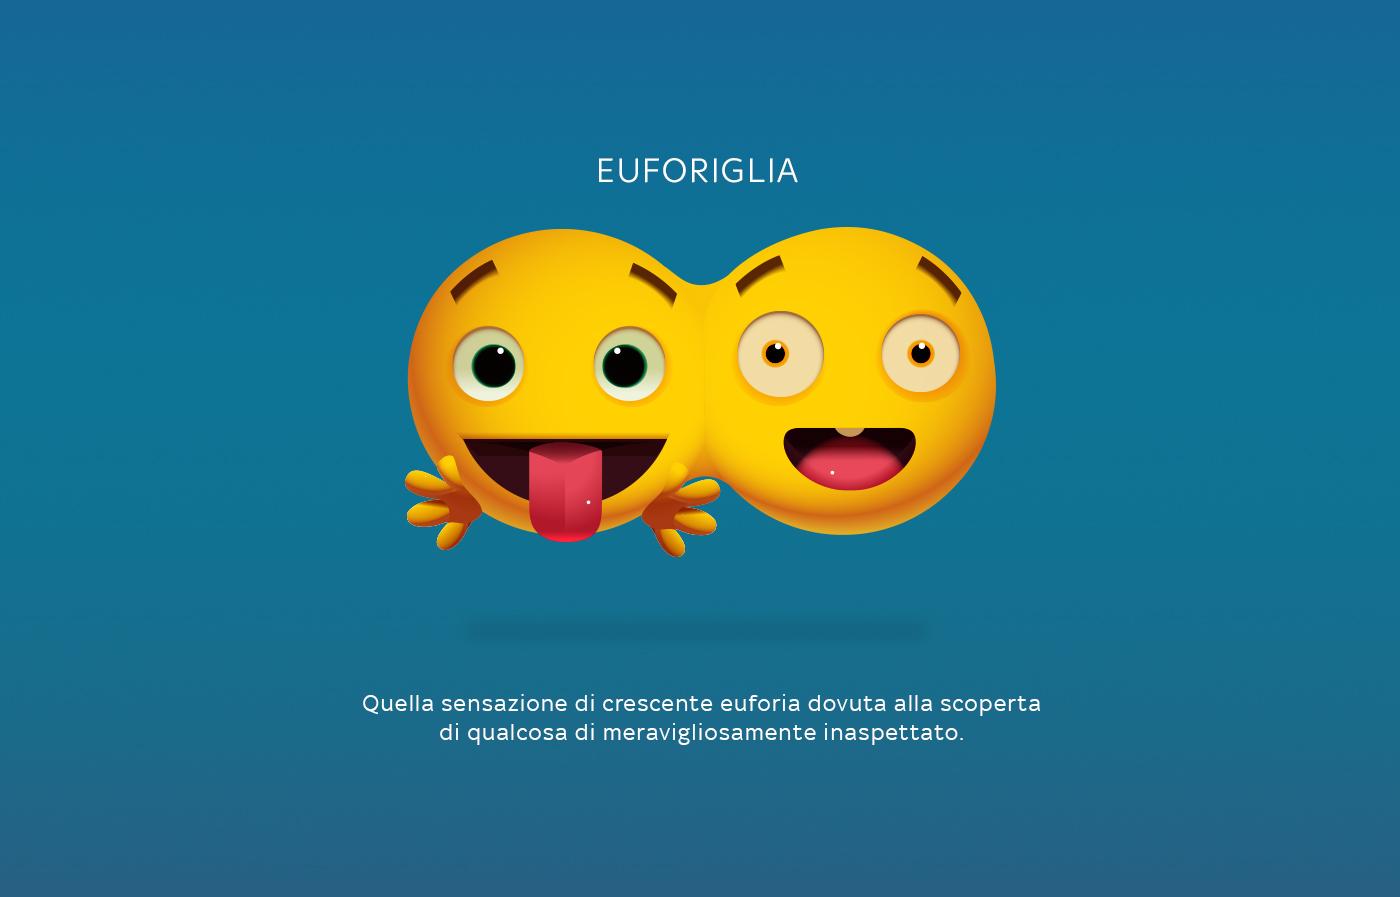 SKY Emoji emoticons skymoji emotions Mockup facebook iphone android imessage